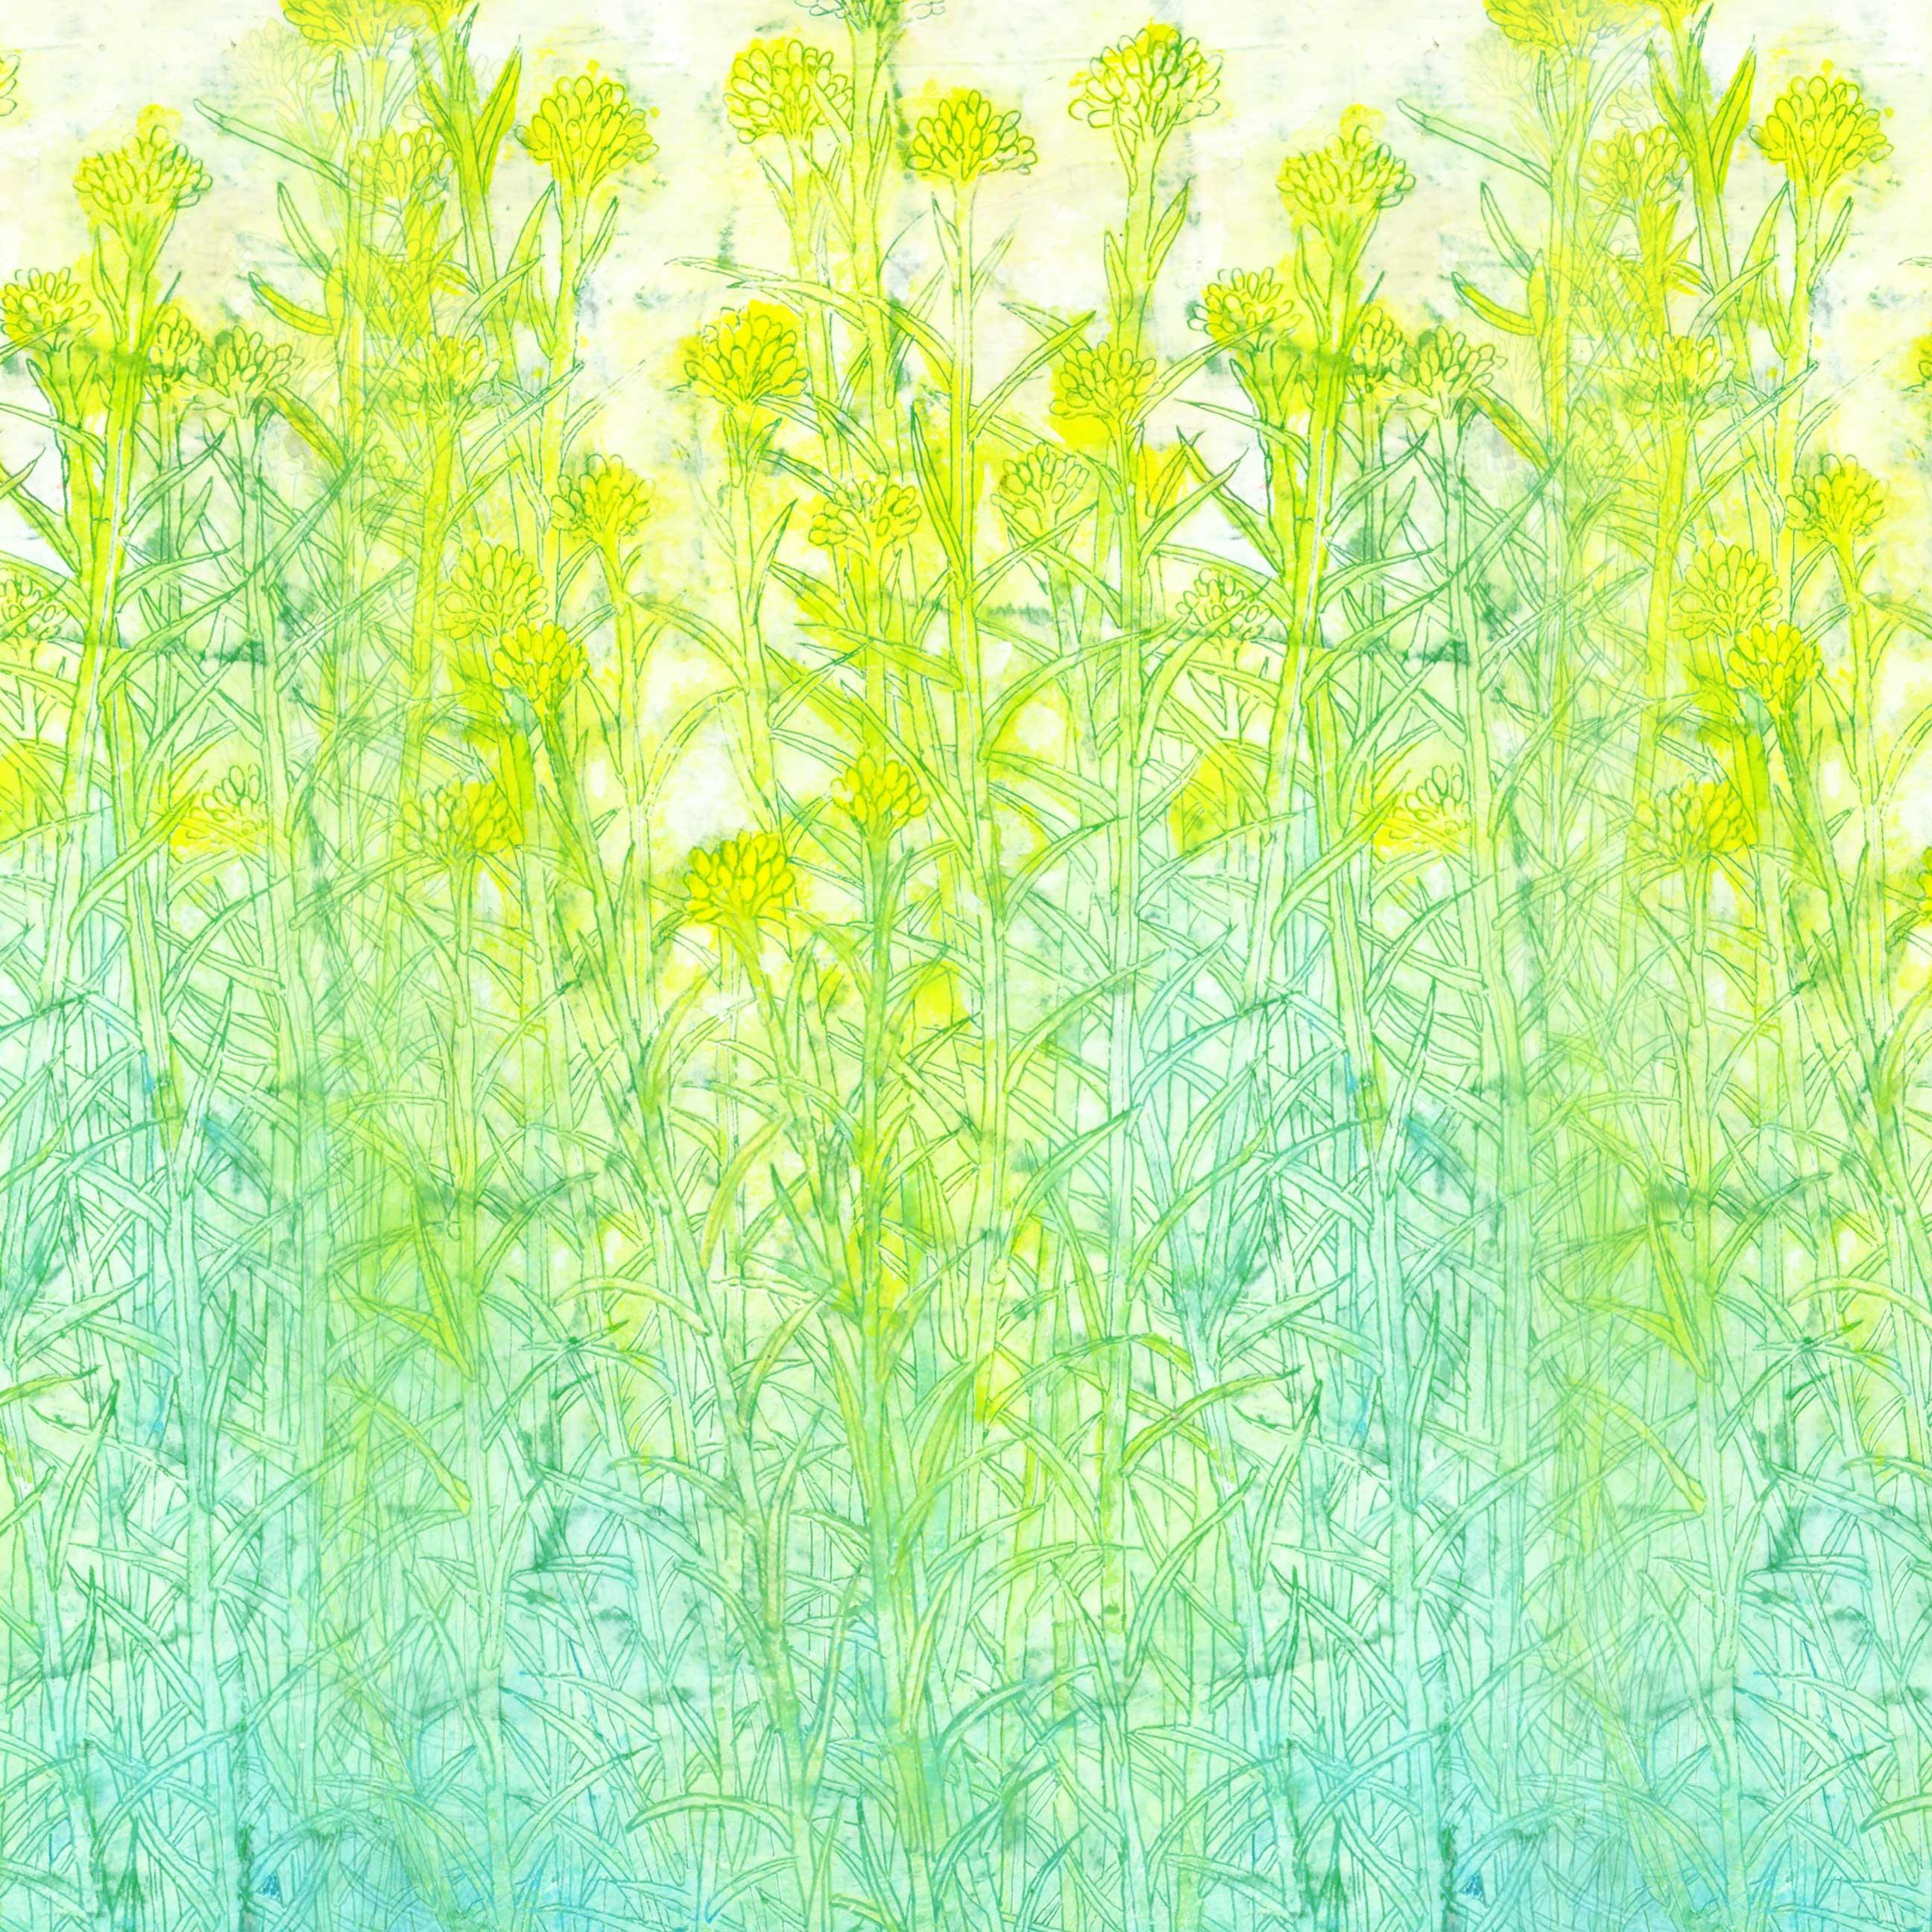 wp yellowgreen Planted スマートフォン用壁紙